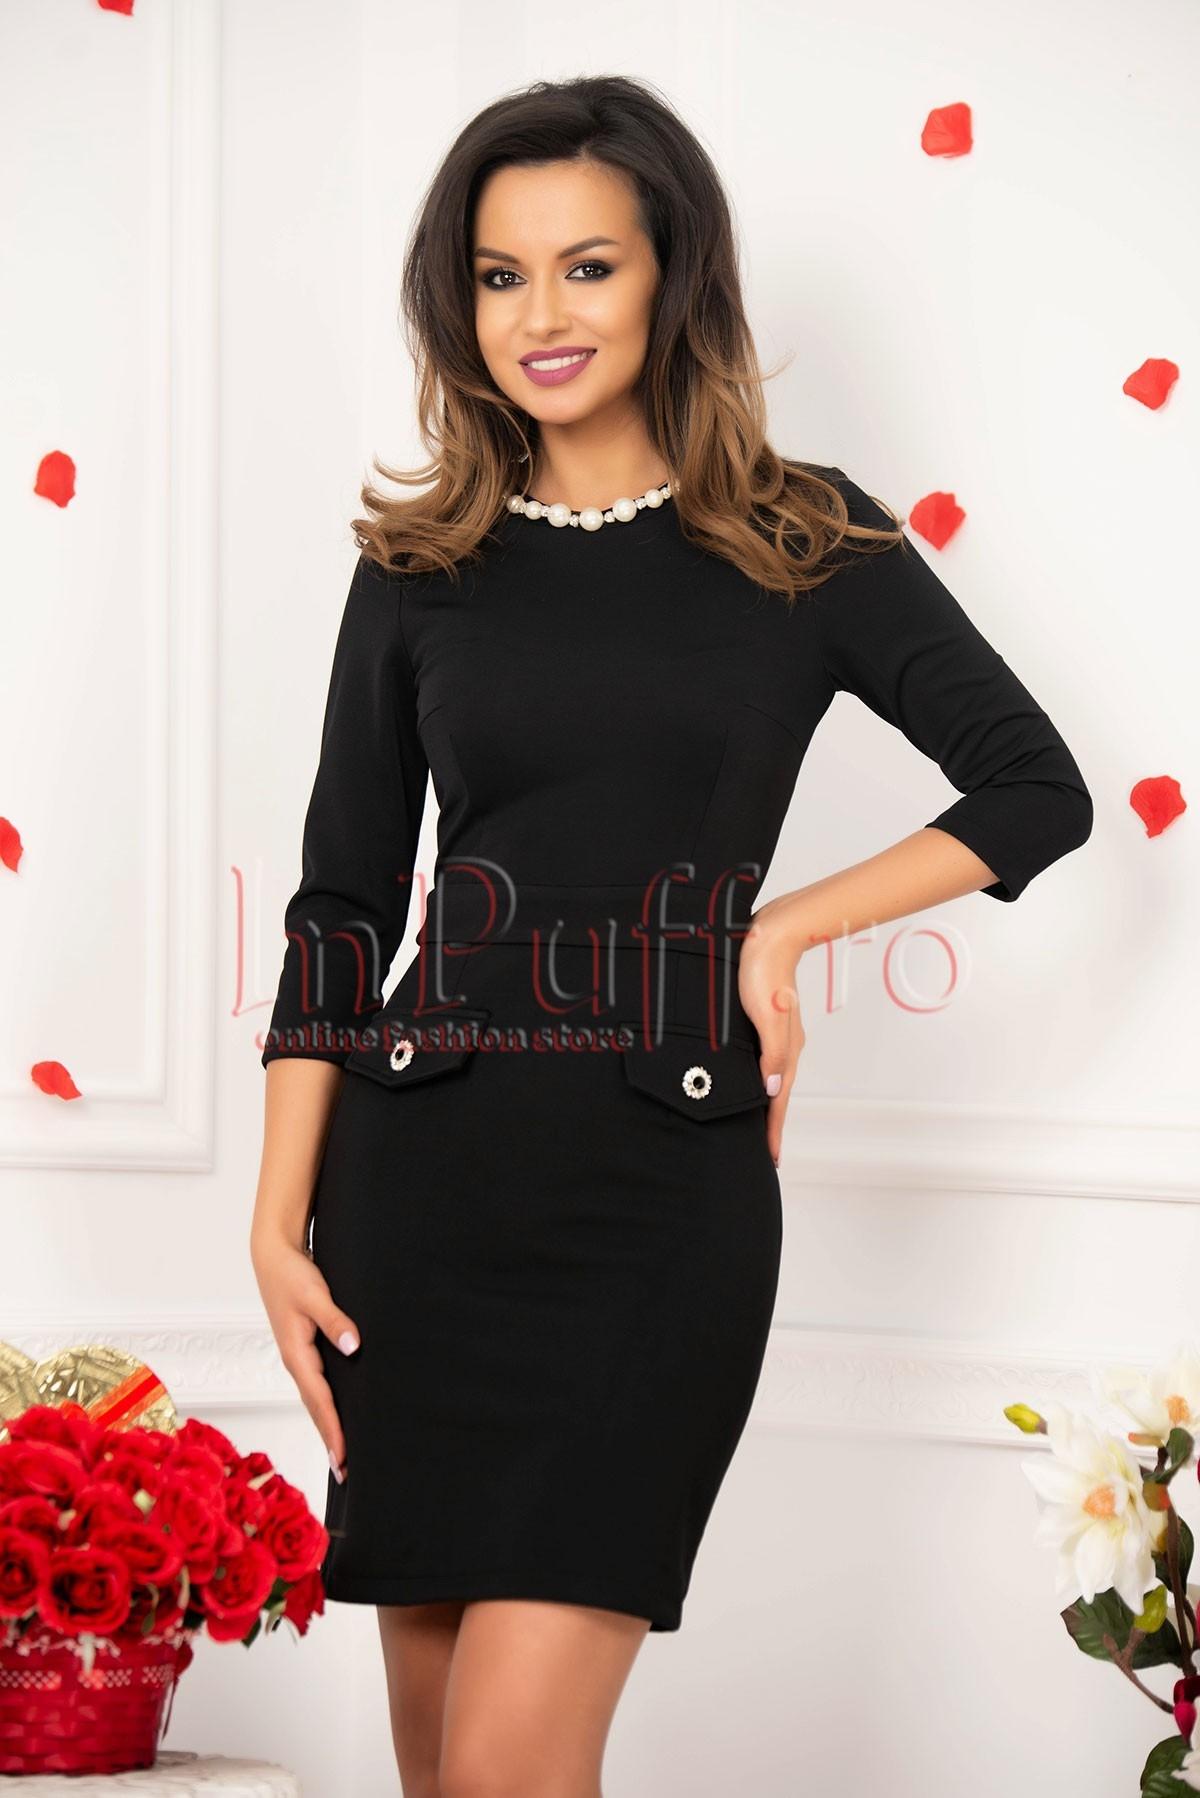 Rochie neagra cu colier din perle